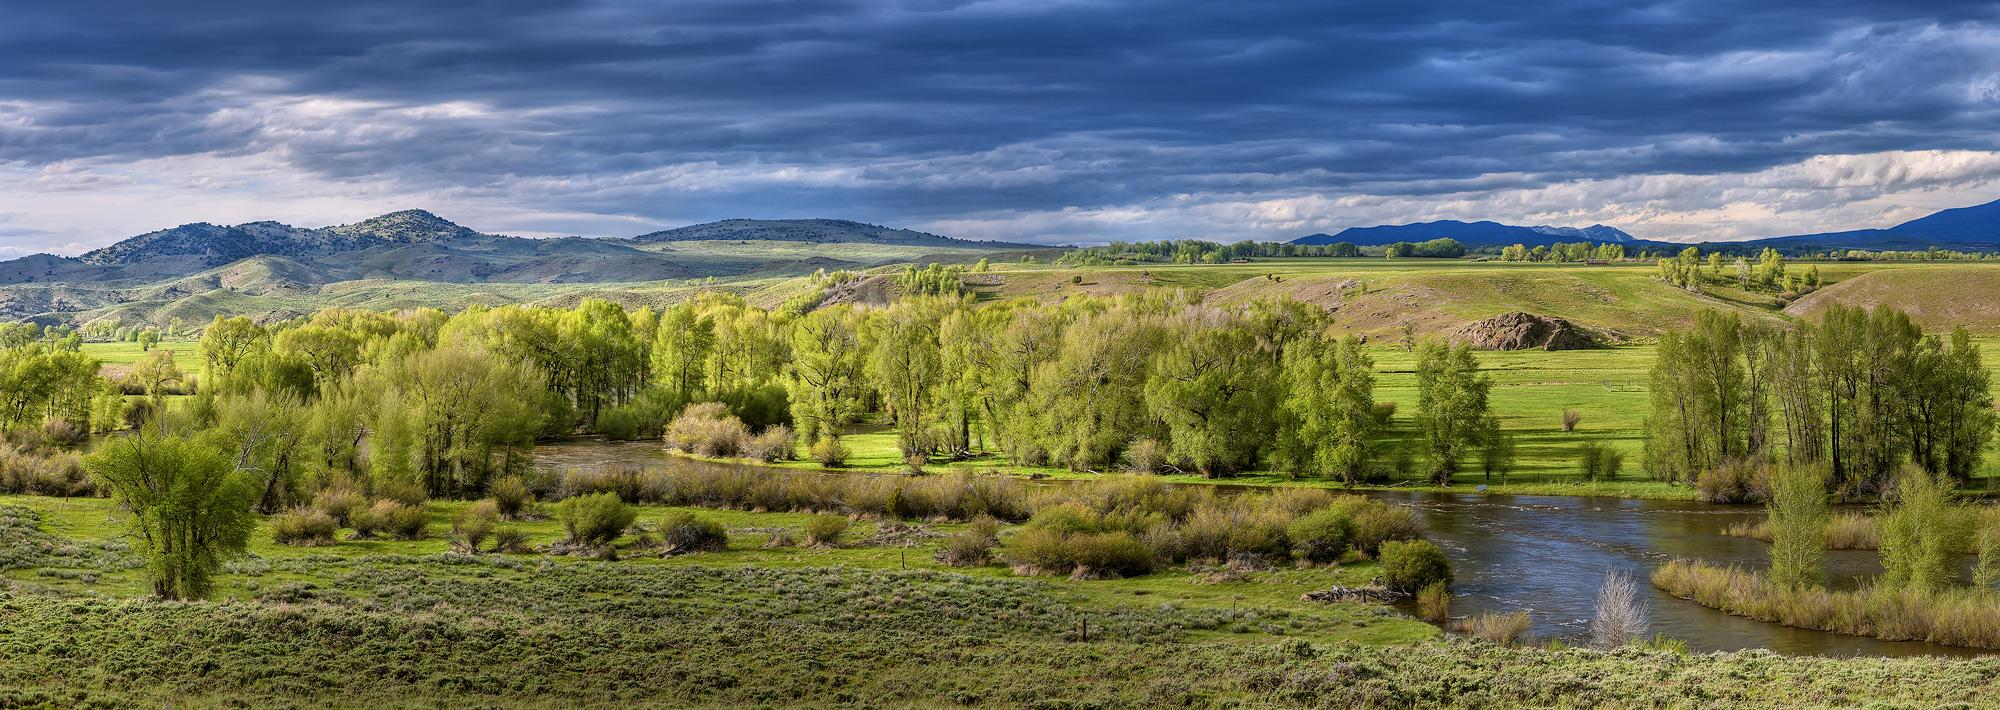 Platte River, Saratoga, Encampment, Spring, photo